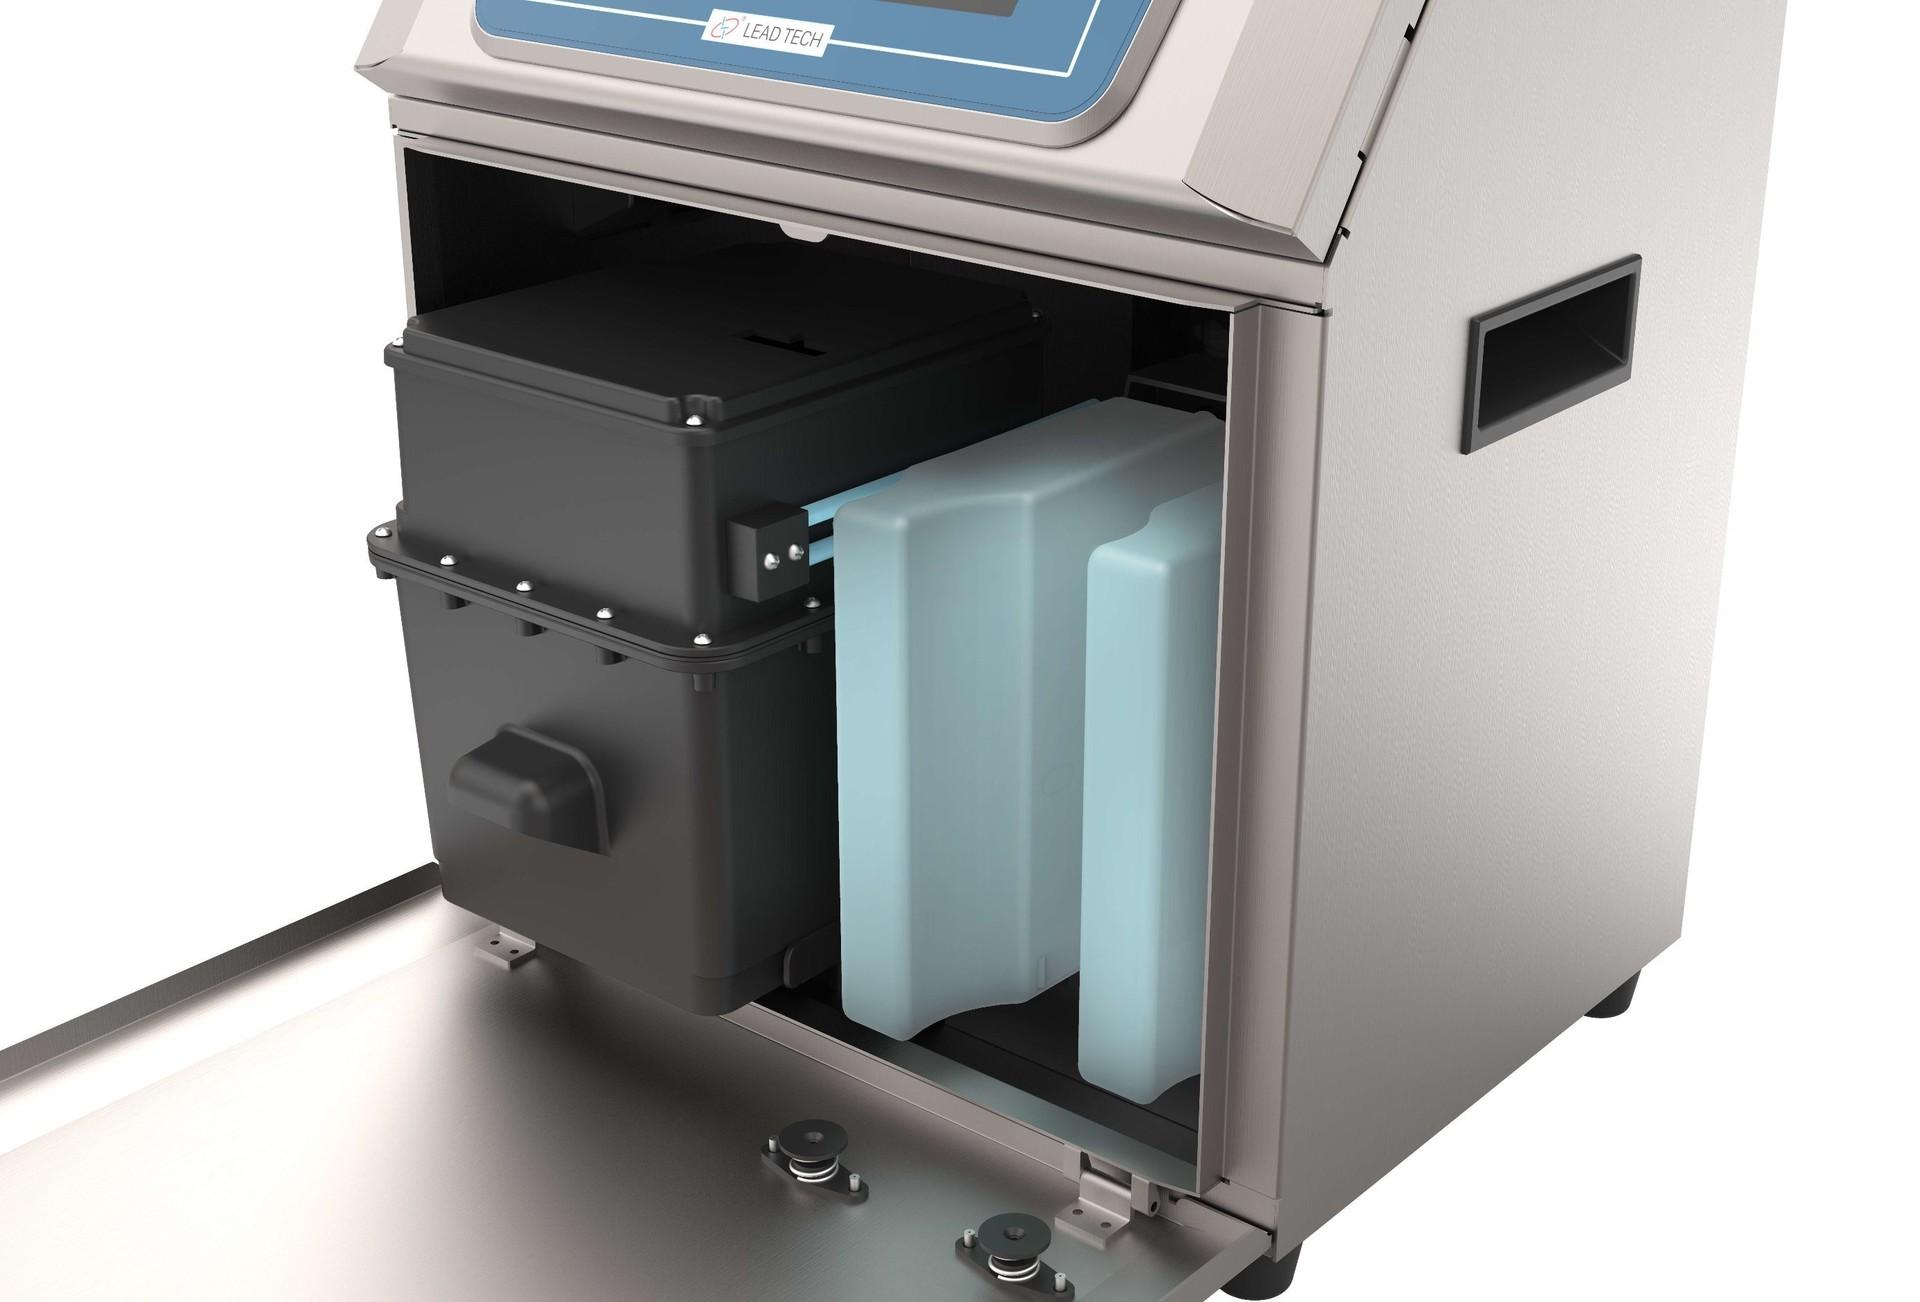 Lead Tech Lt800 Coding and Marking Cij Inkjet Printer